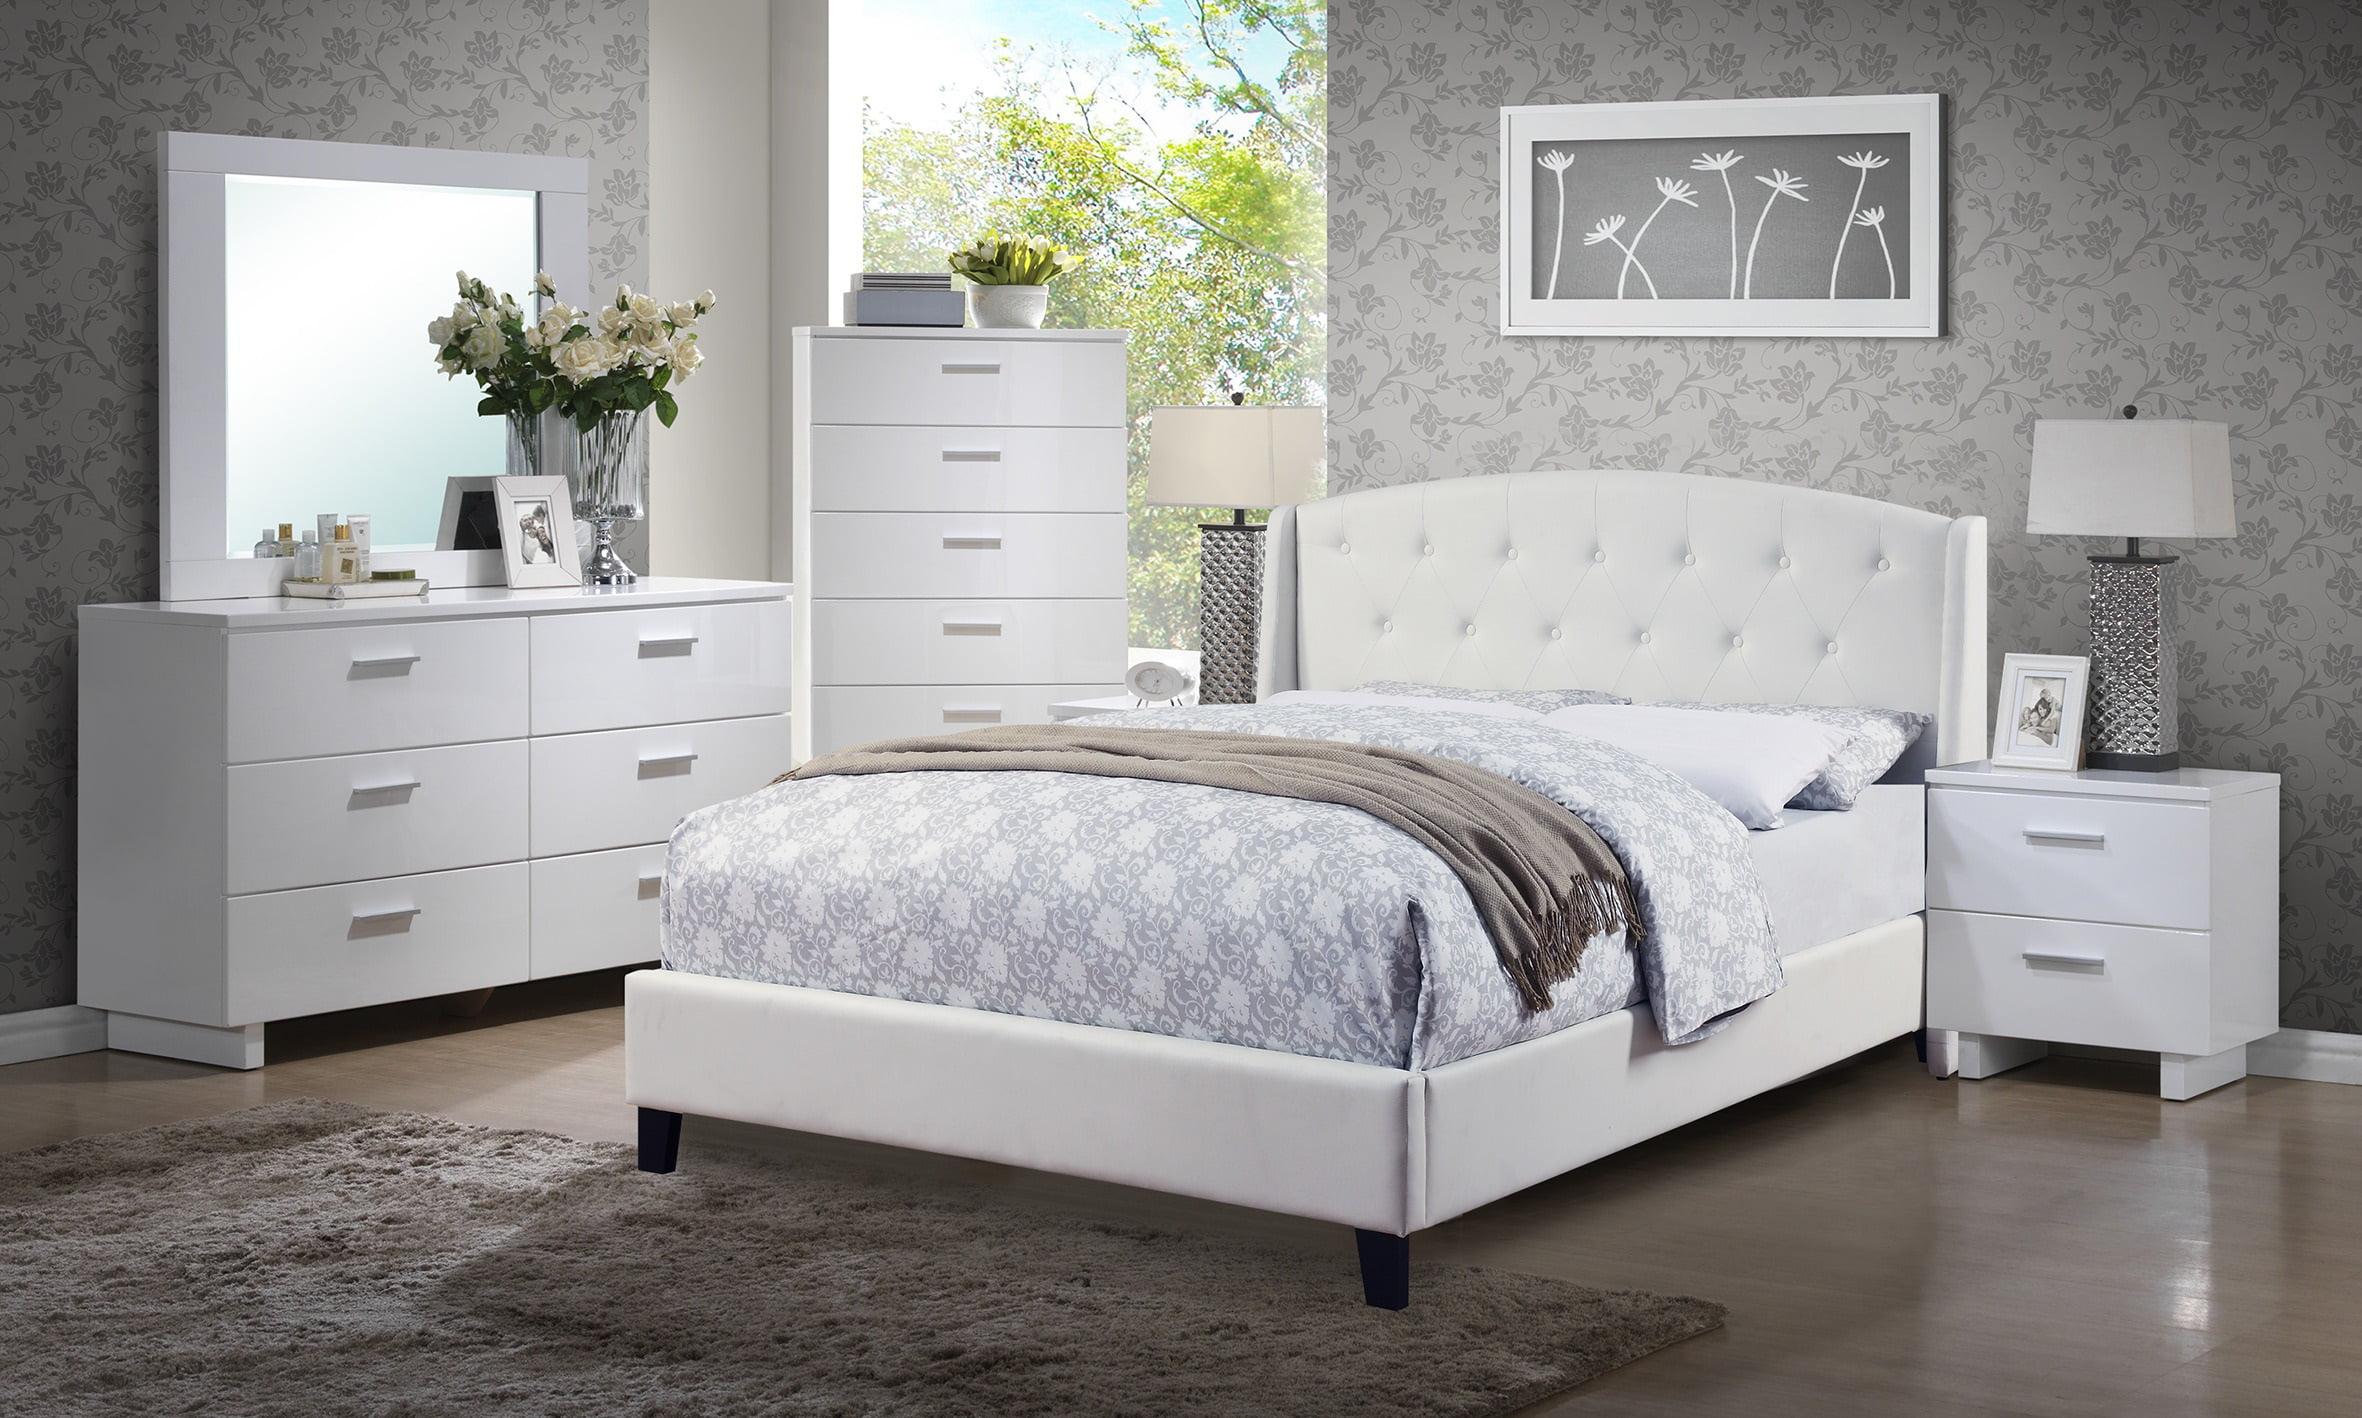 contemporary decor 4pc set white bedroom furniture classic